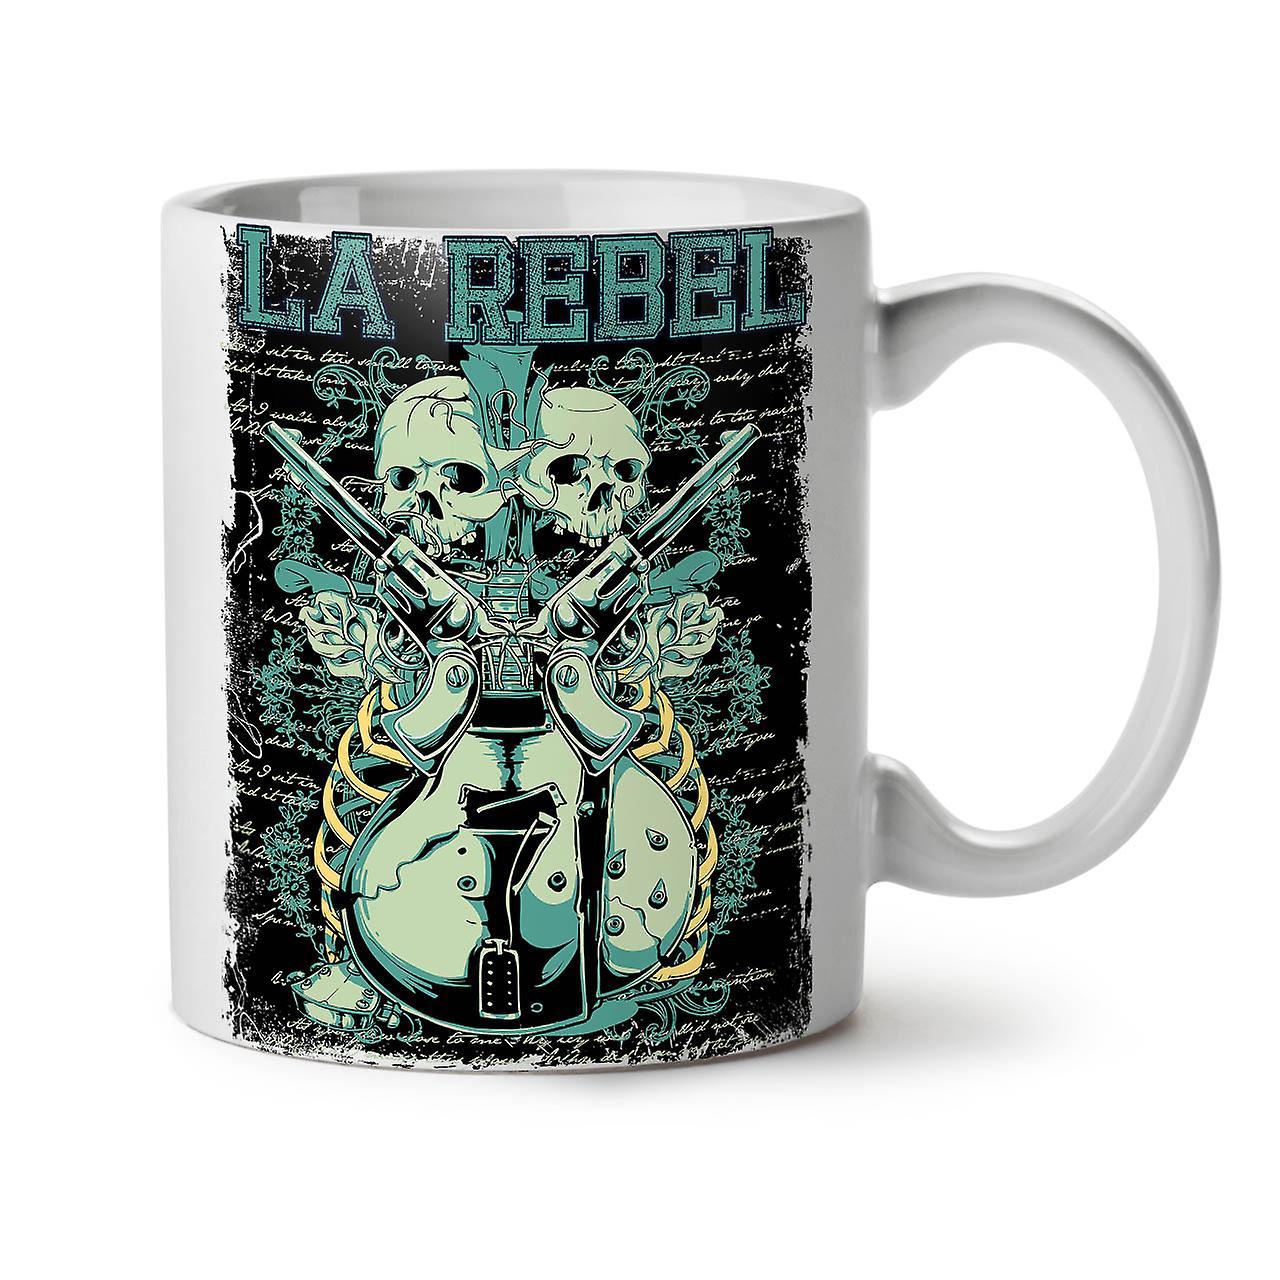 Rebelles Gun Café Tasse Thé Blanc OzWellcoda Mafia Nouveau Les Céramique 11 vN8wmn0